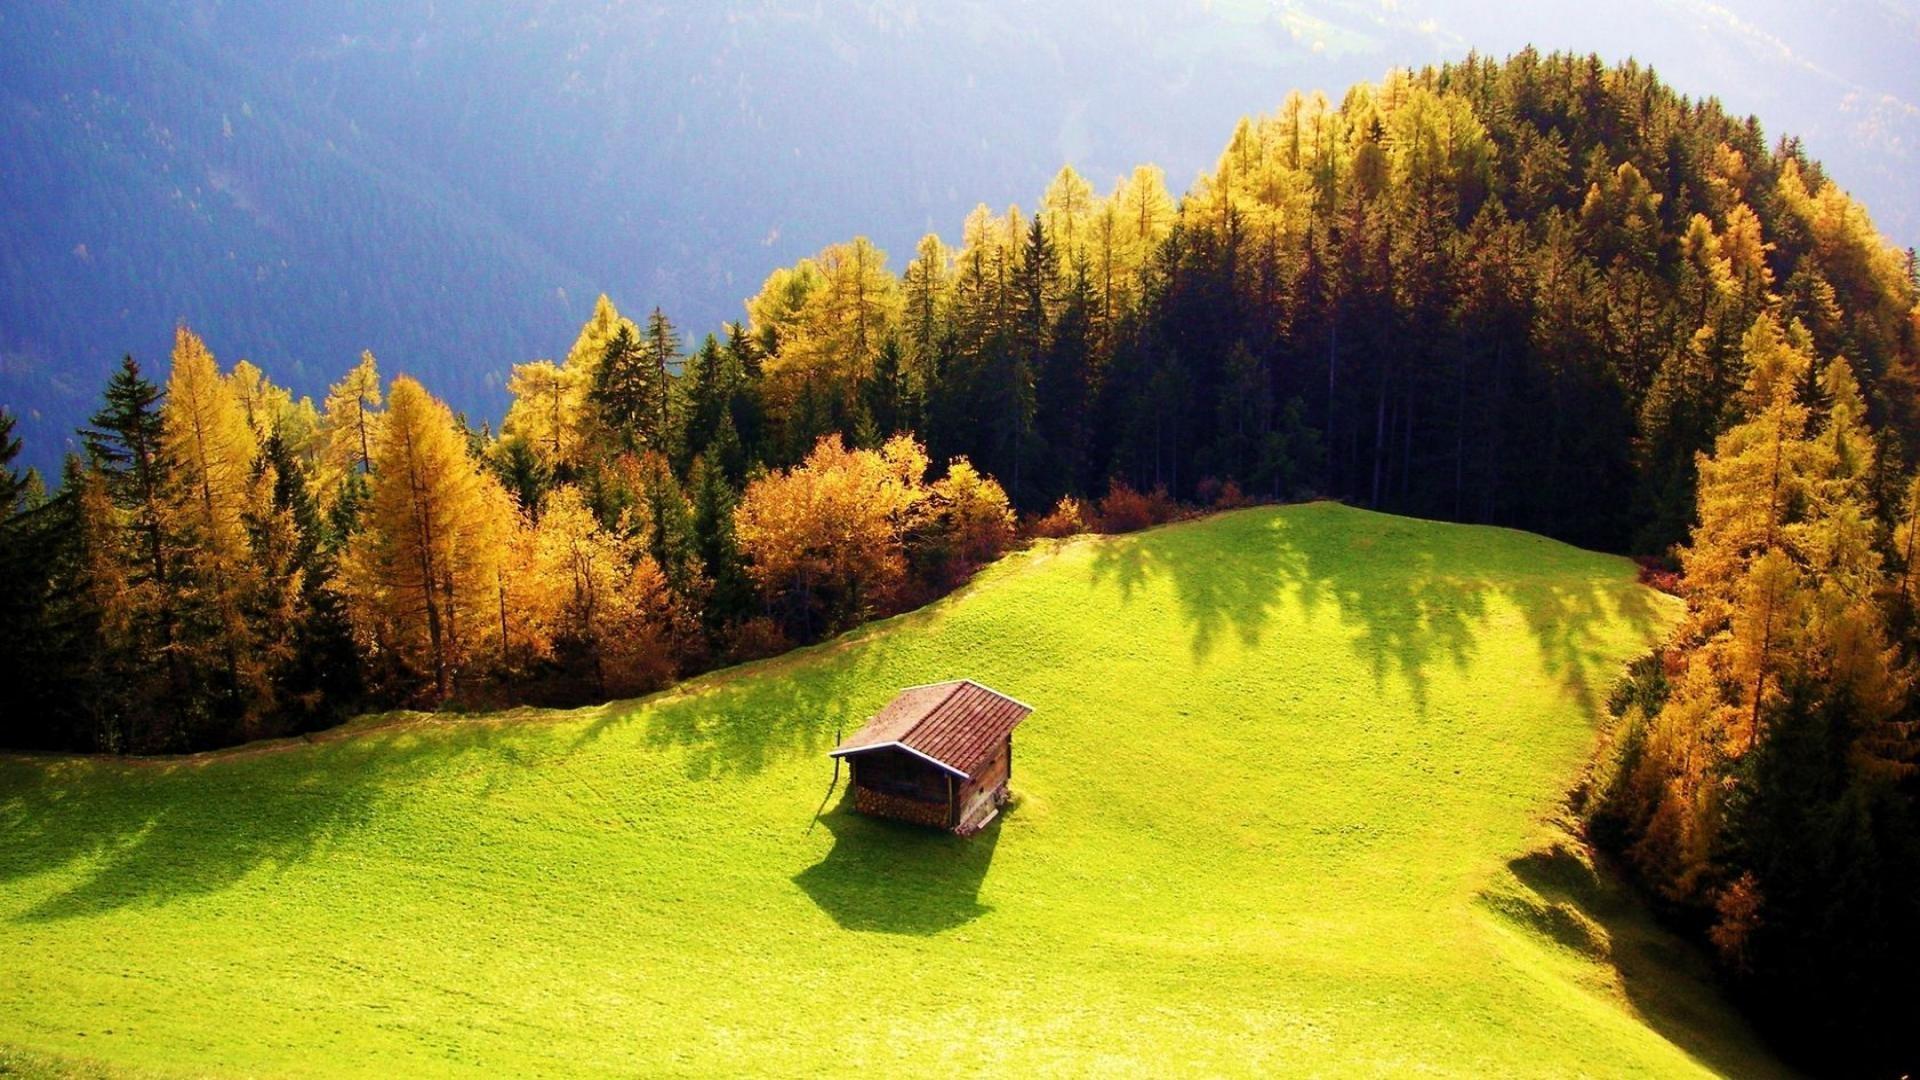 android安卓小屋 小房子 野外 风景 风光 美景 旅游